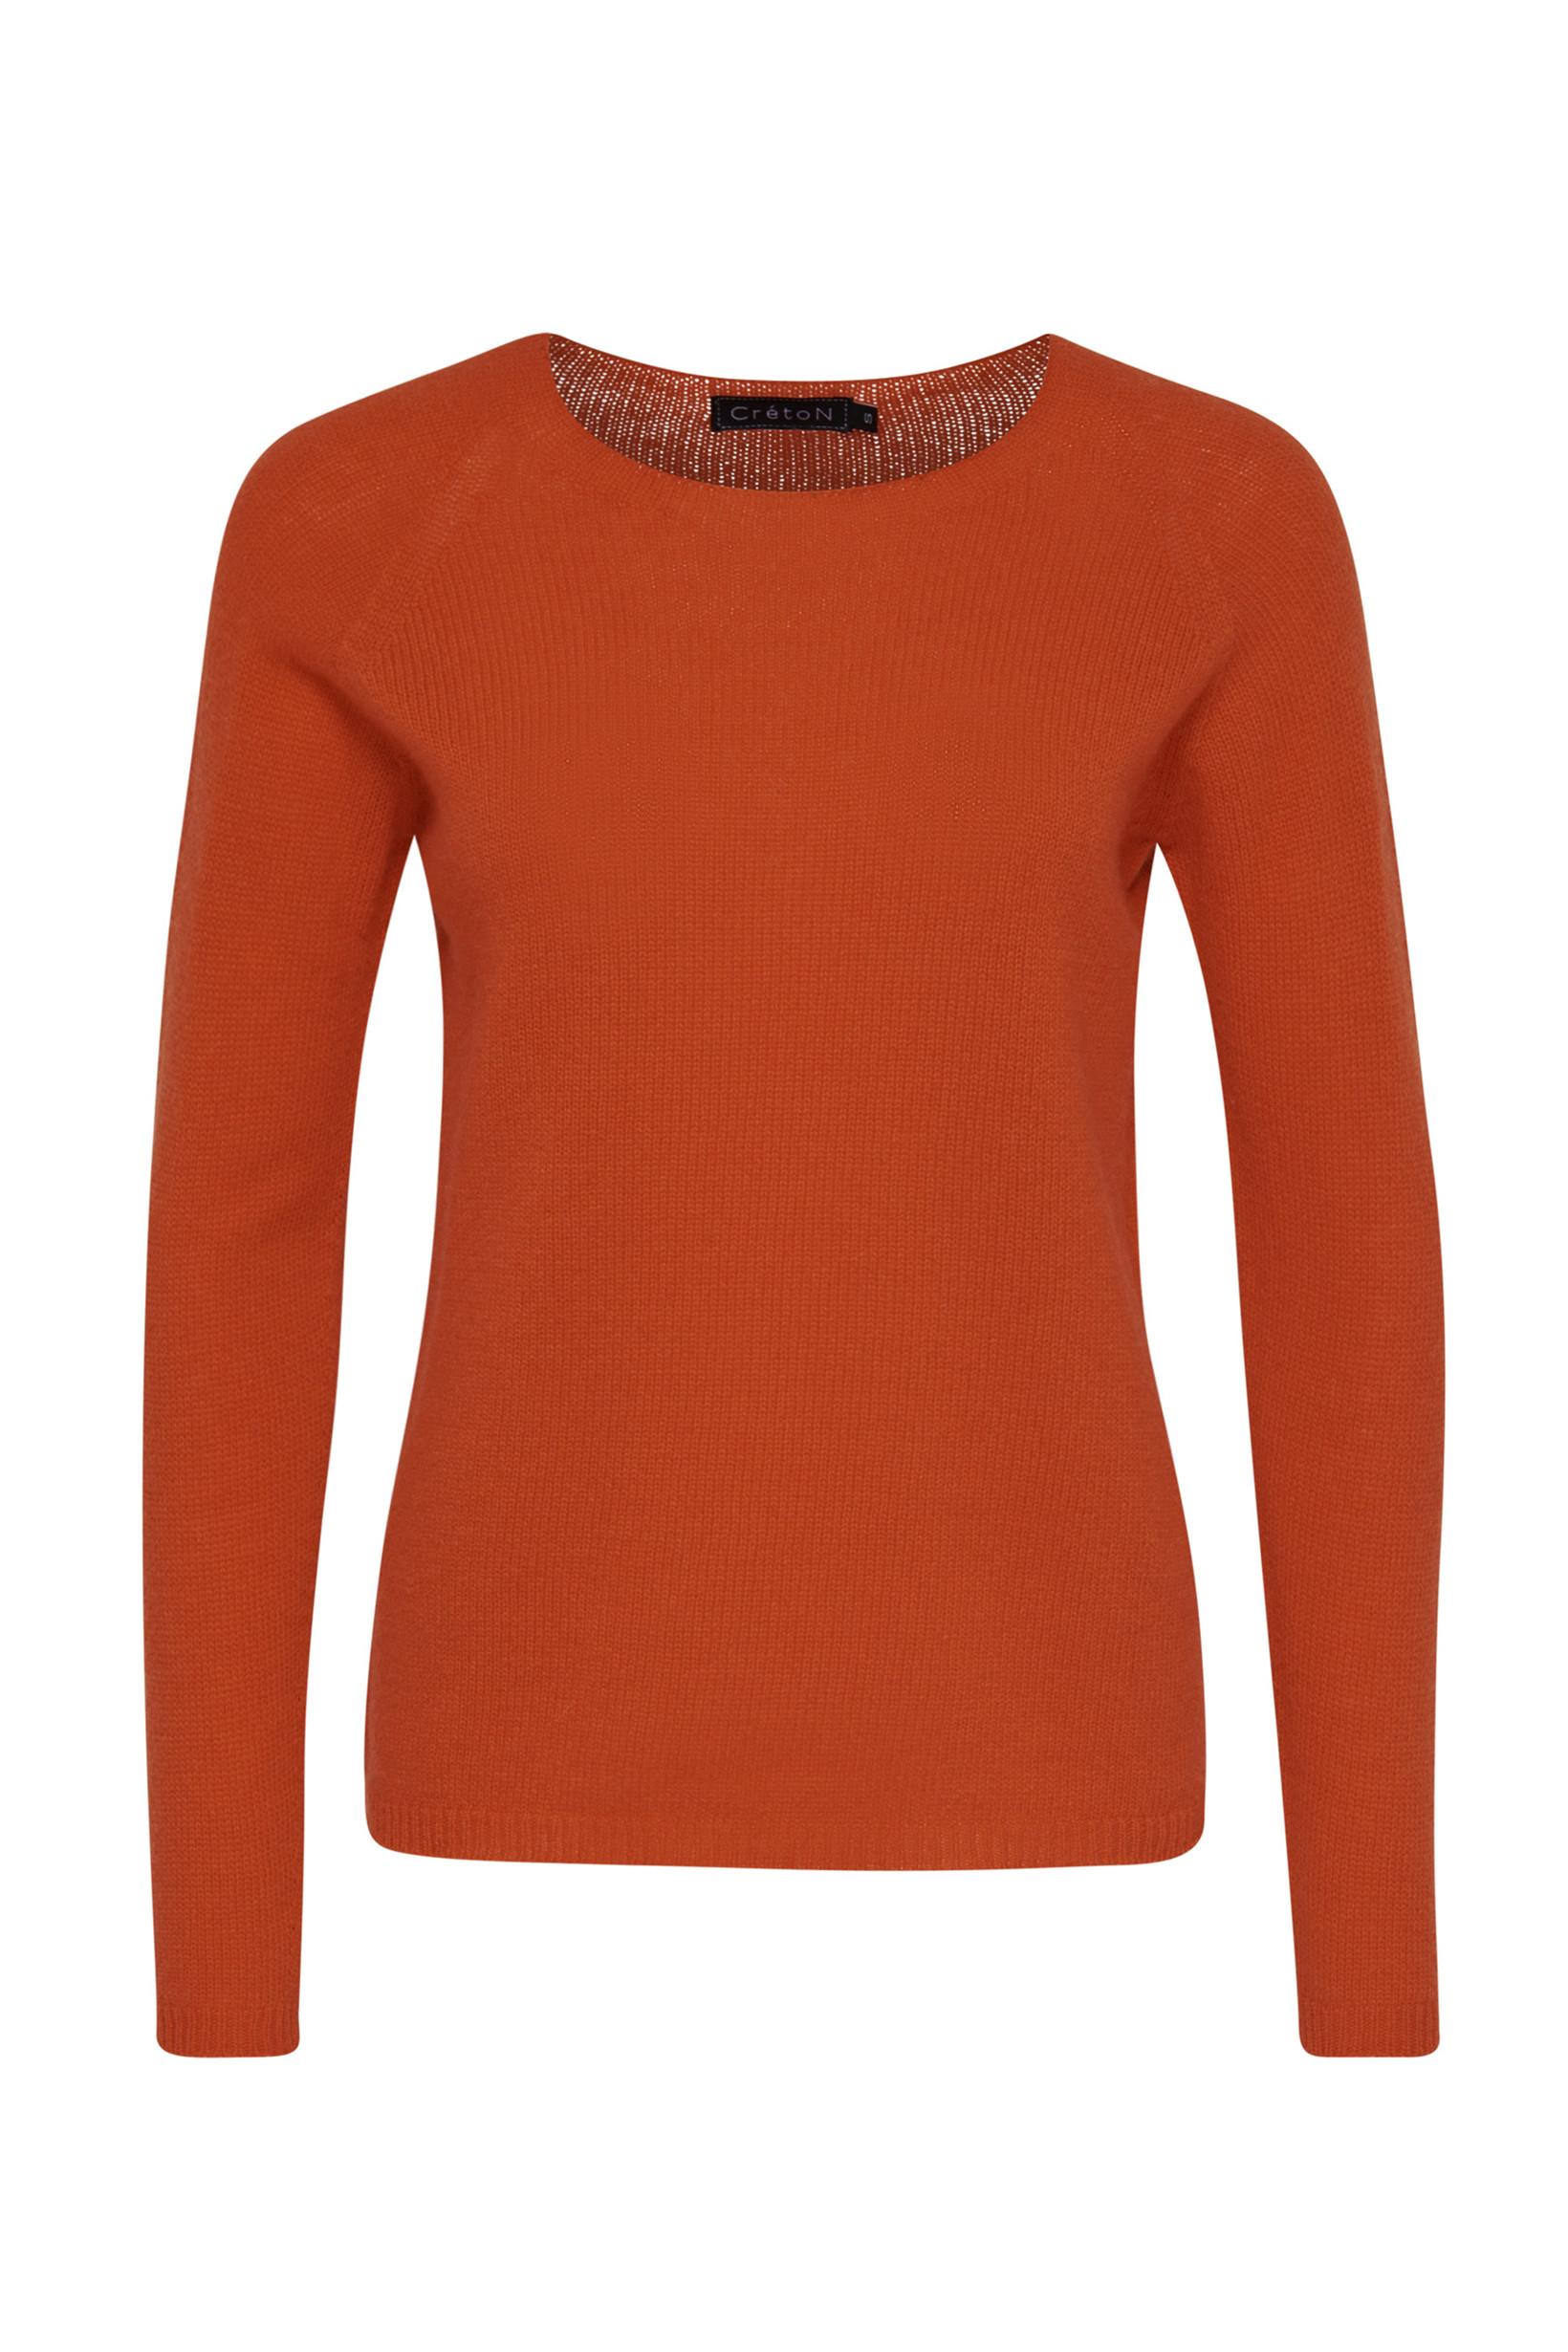 CRÉTON Linea kashmir sweater 480 S